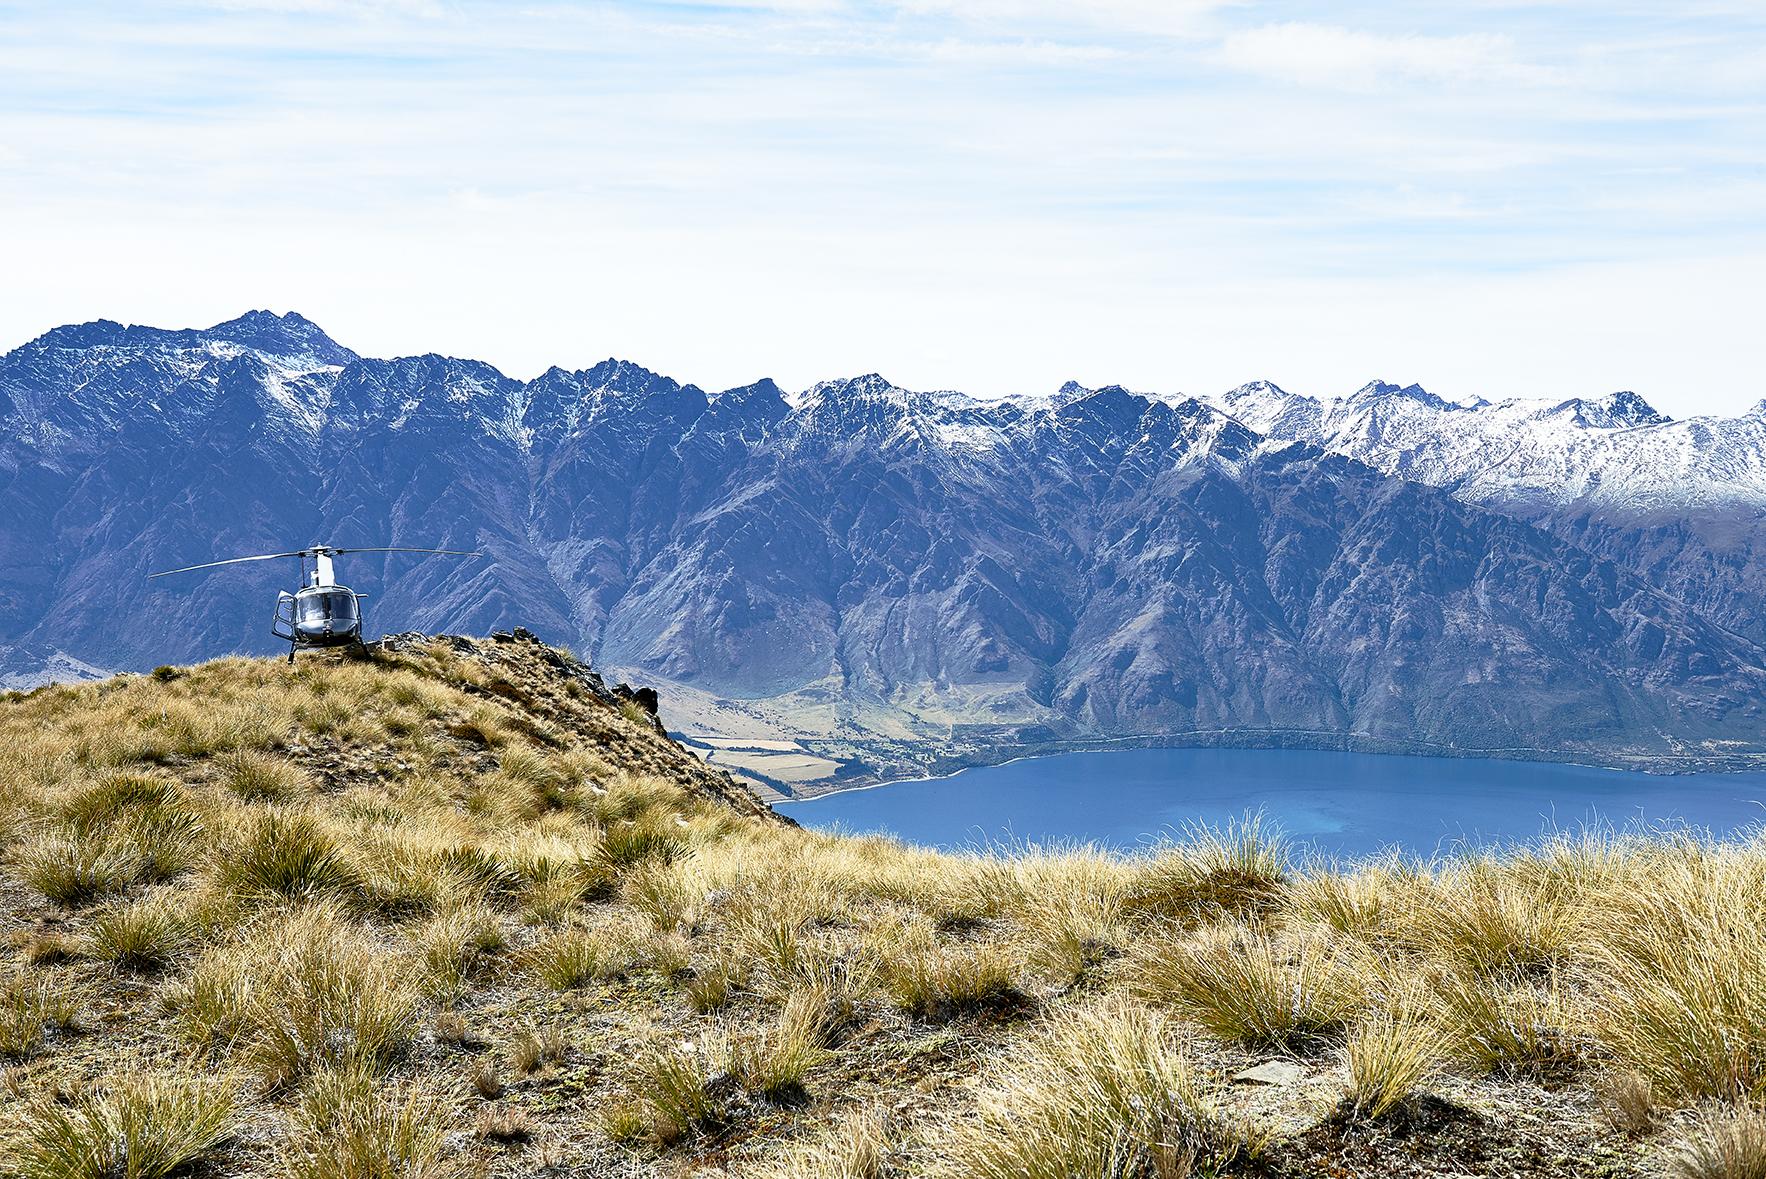 New-Zealand-Travels-Photography-Mark-SullivanBradley-1.jpg